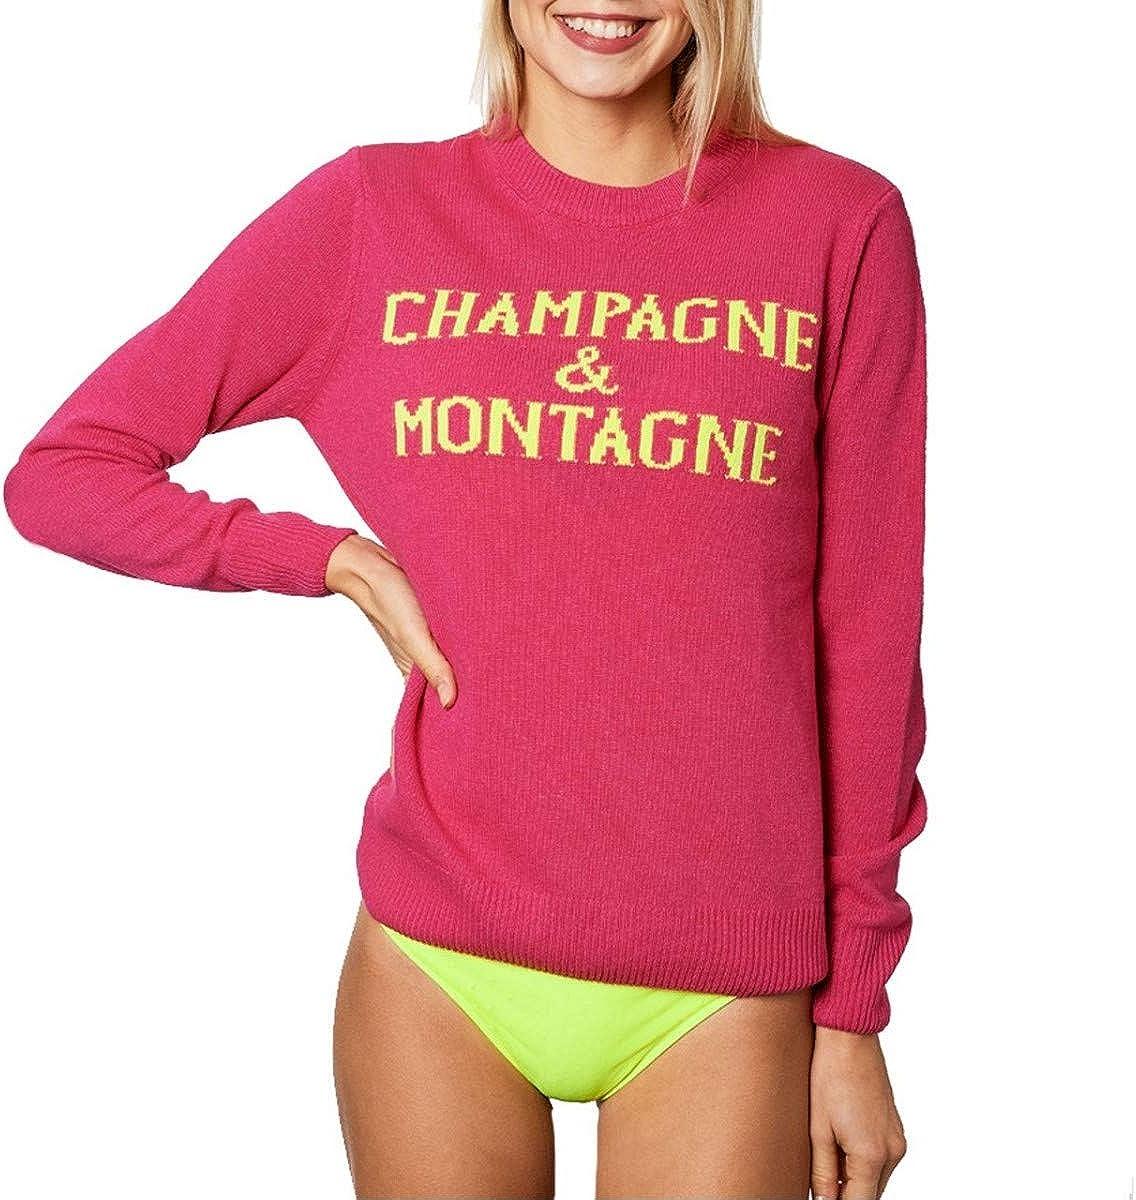 MC2 Saint Barth, Crewneck Sweater Champagne & Montagne, Rosa, MC2_QUE001 MNCH25 Rosa